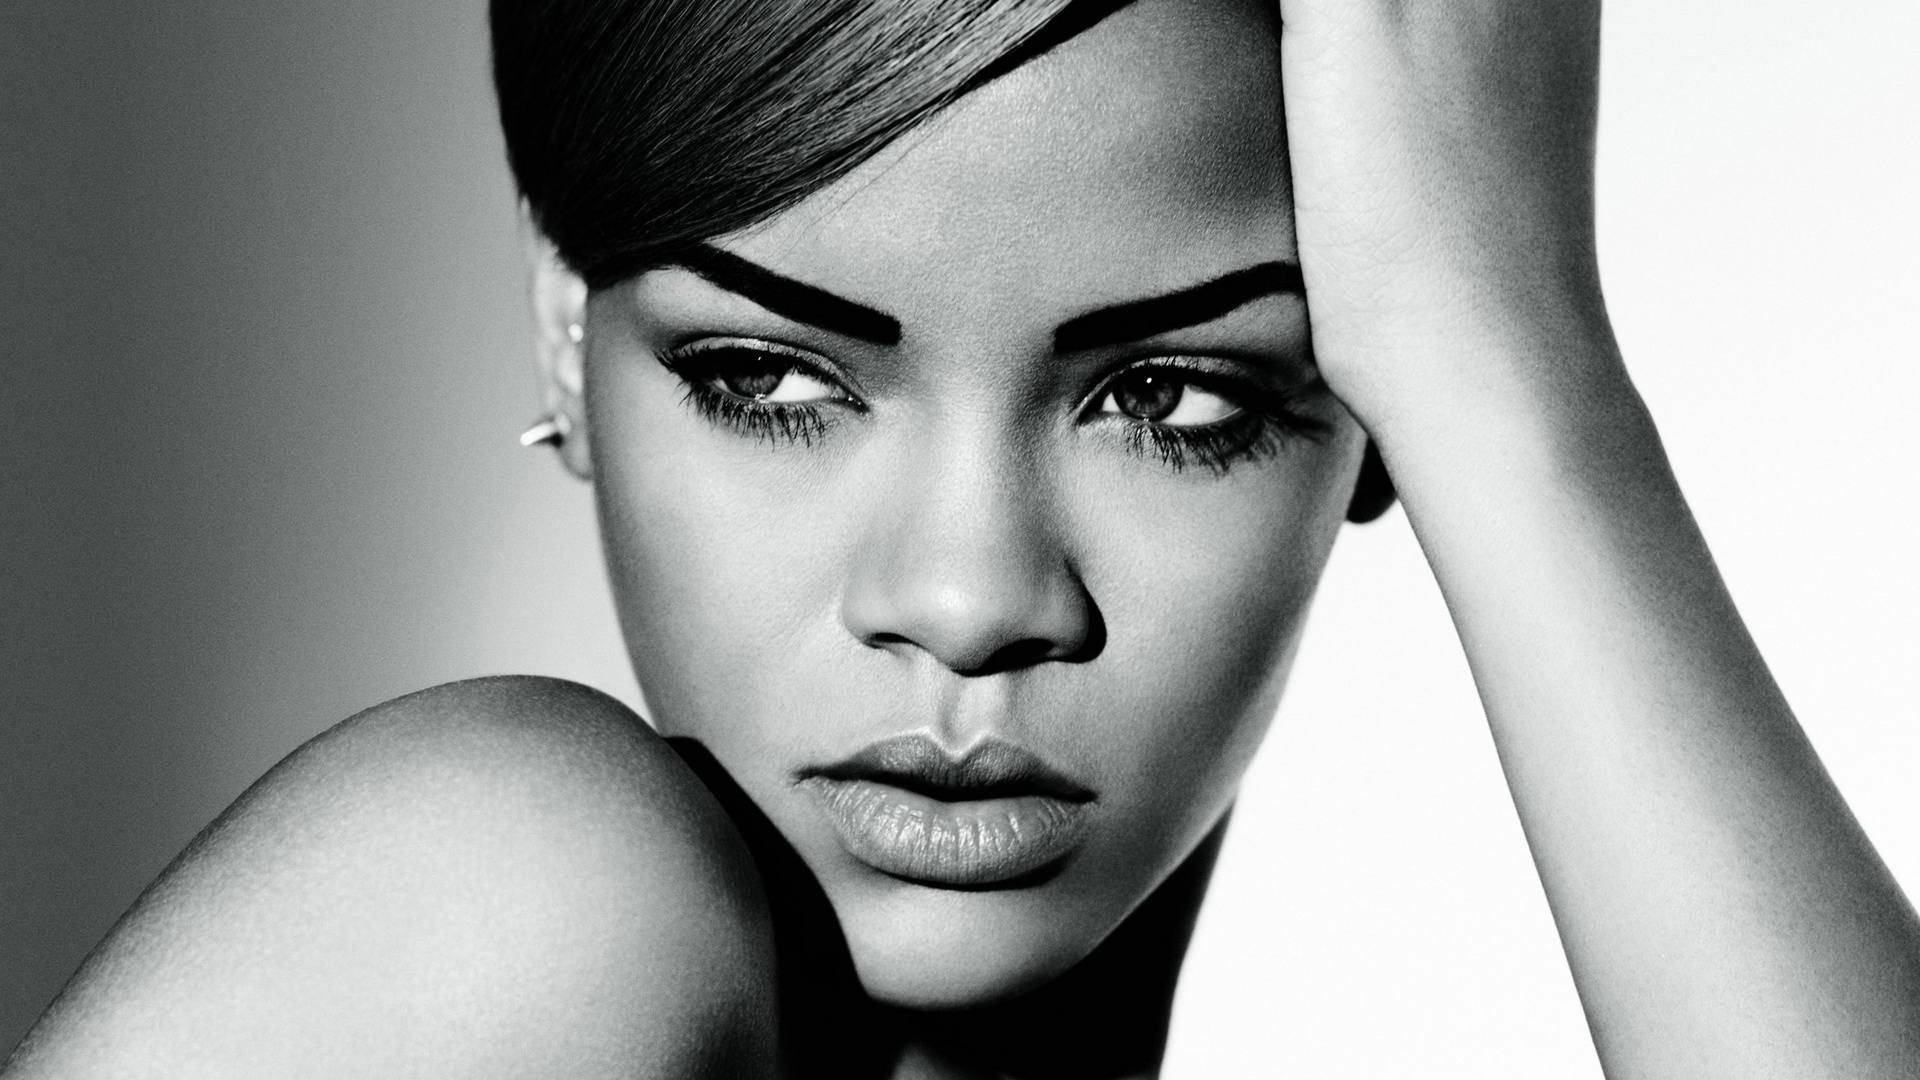 Rihanna full hd wallpaper and background image 1920x1080 id321566 music rihanna wallpaper voltagebd Gallery